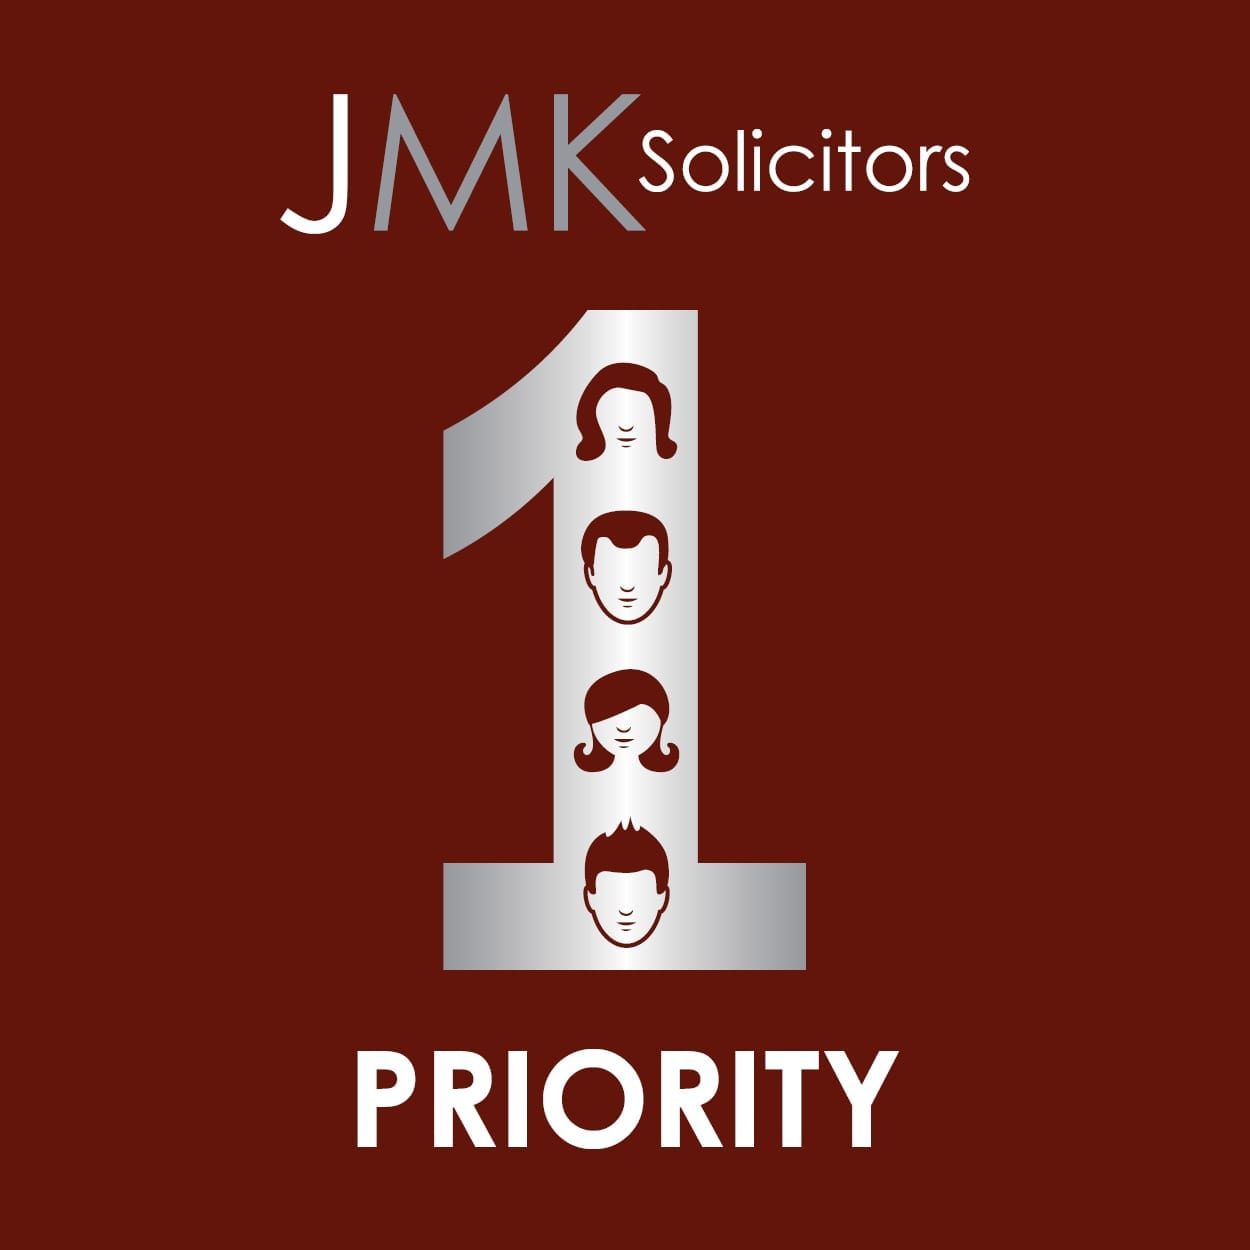 Priority JMK Solicitors Values